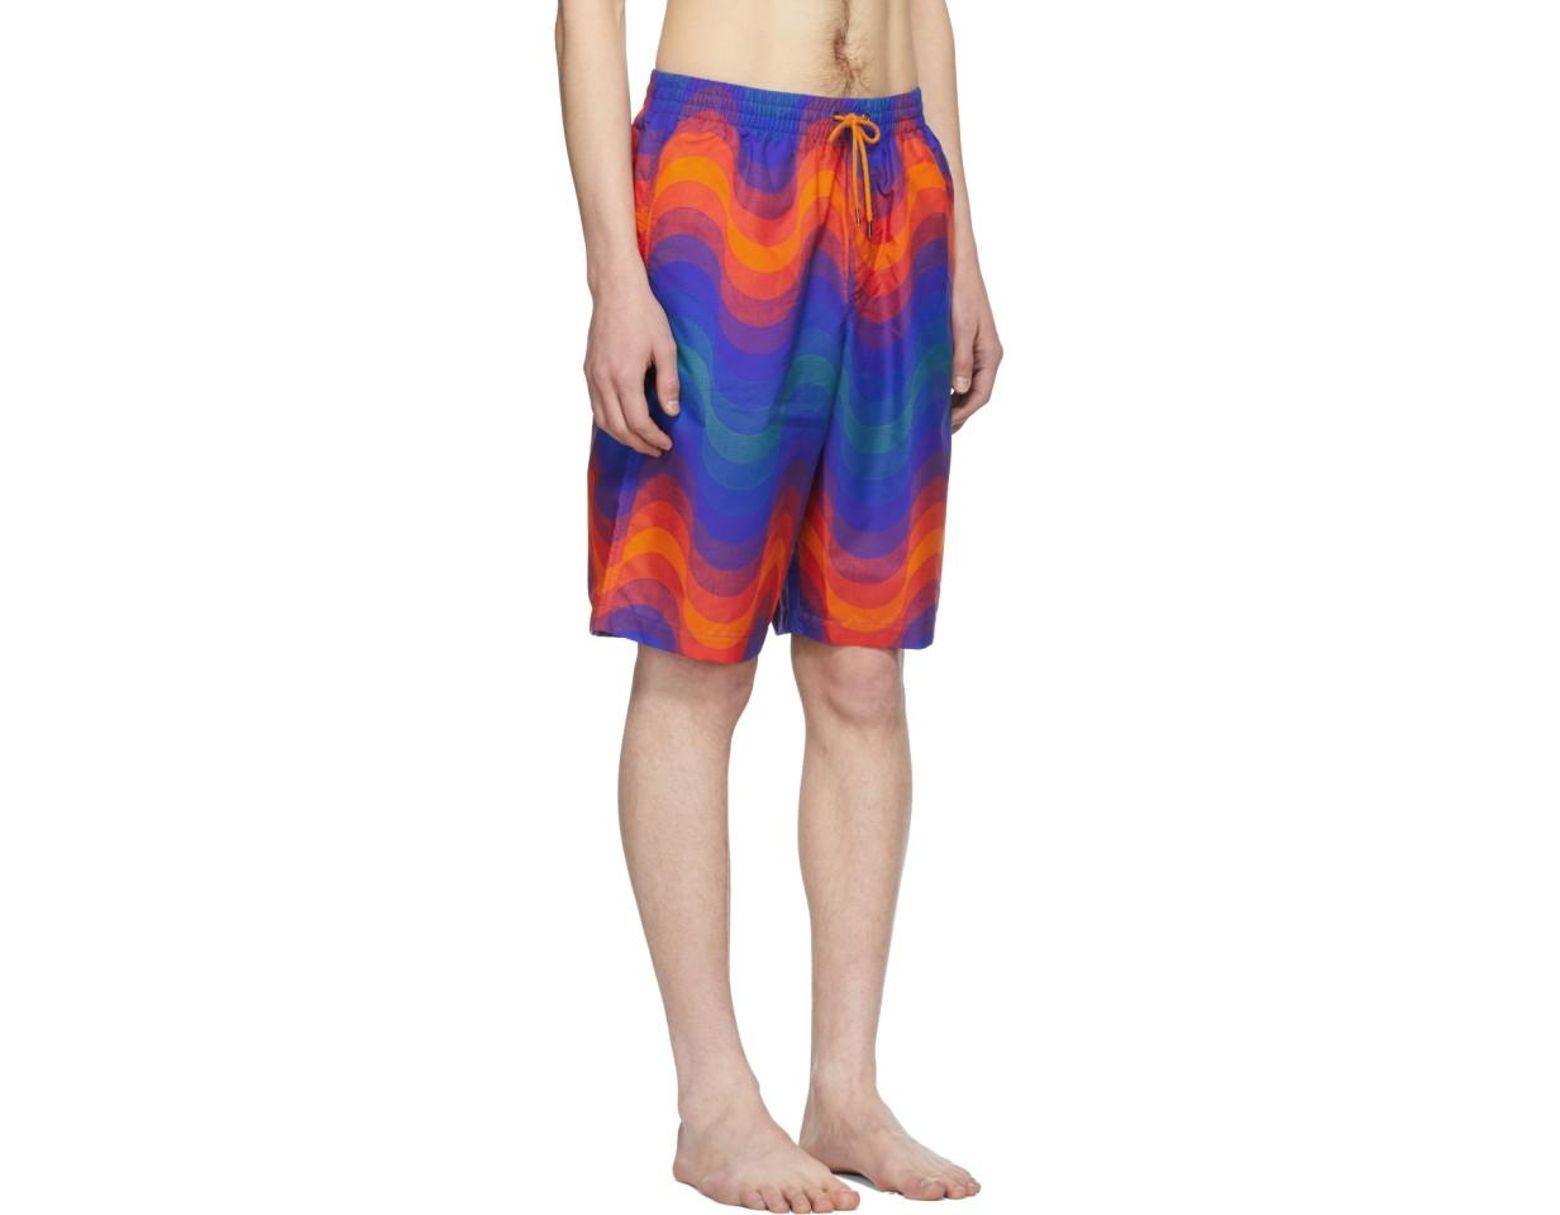 04bdcdb790 Dries Van Noten Orange Verner Panton Edition Phibbs Long Swim Shorts in  Orange for Men - Lyst